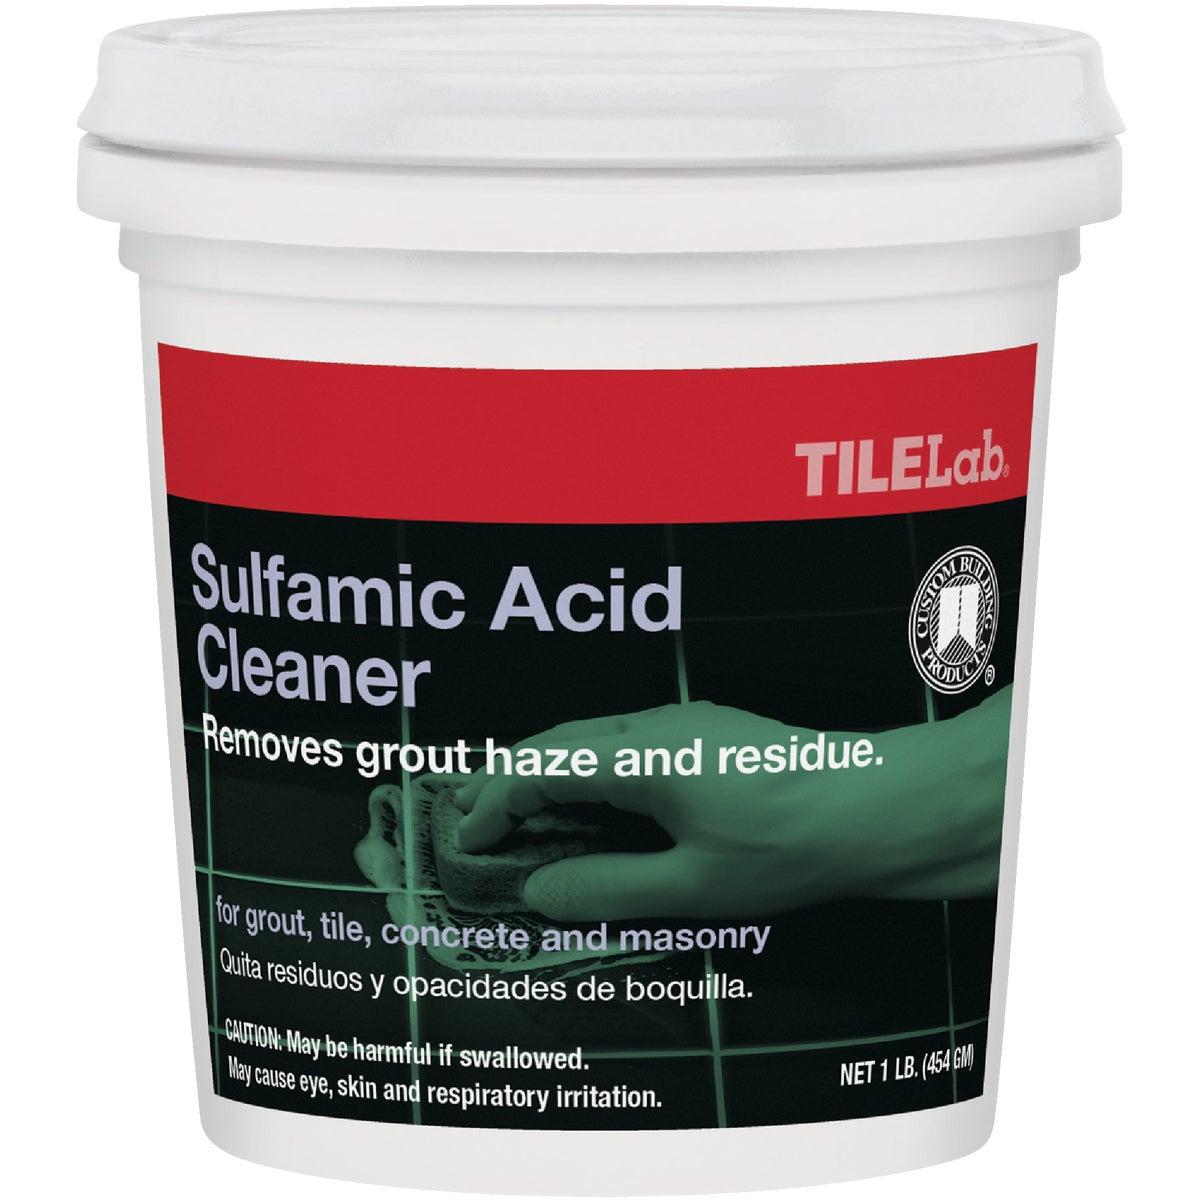 1LB SULFMIC ACID CLEANER